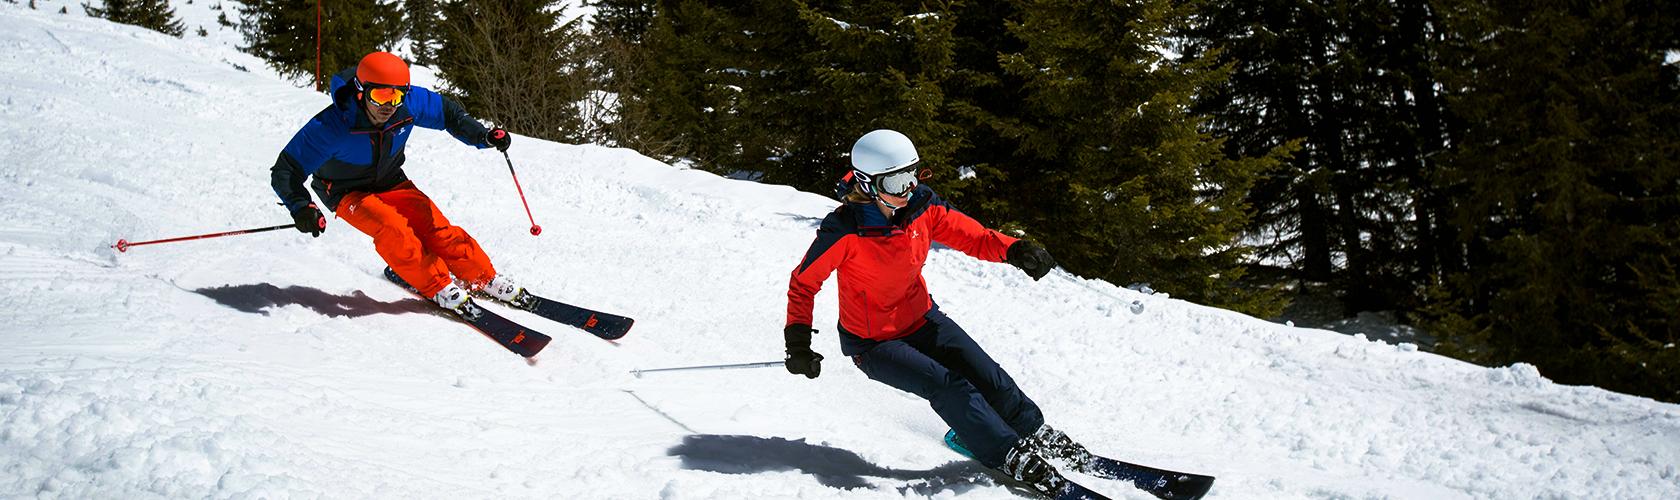 97b119faad Skiing Servicing Guide